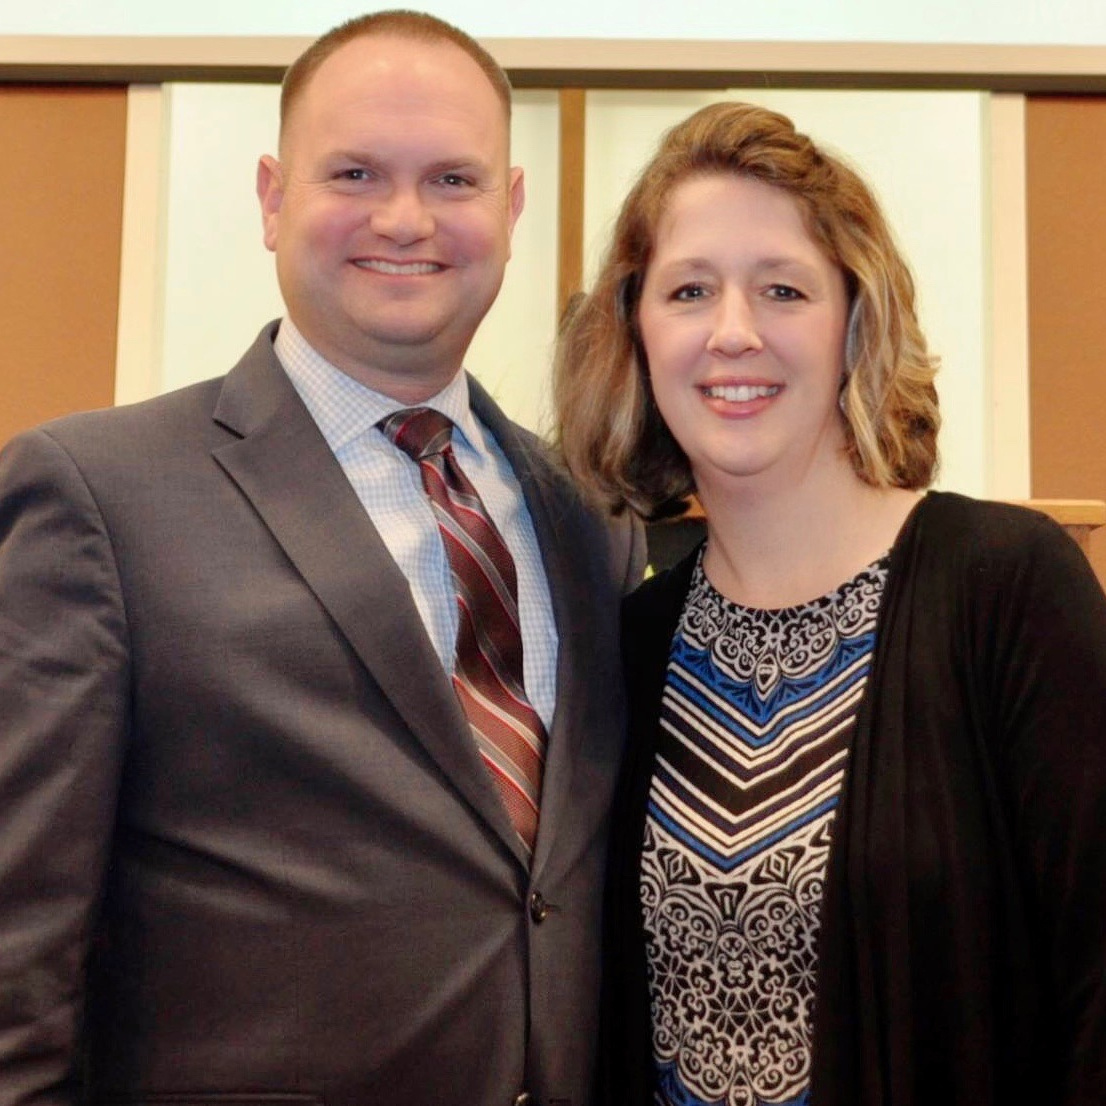 Ryan and Mindy Stevens Associate Pastor, Deacon, Registrar, Business Manager